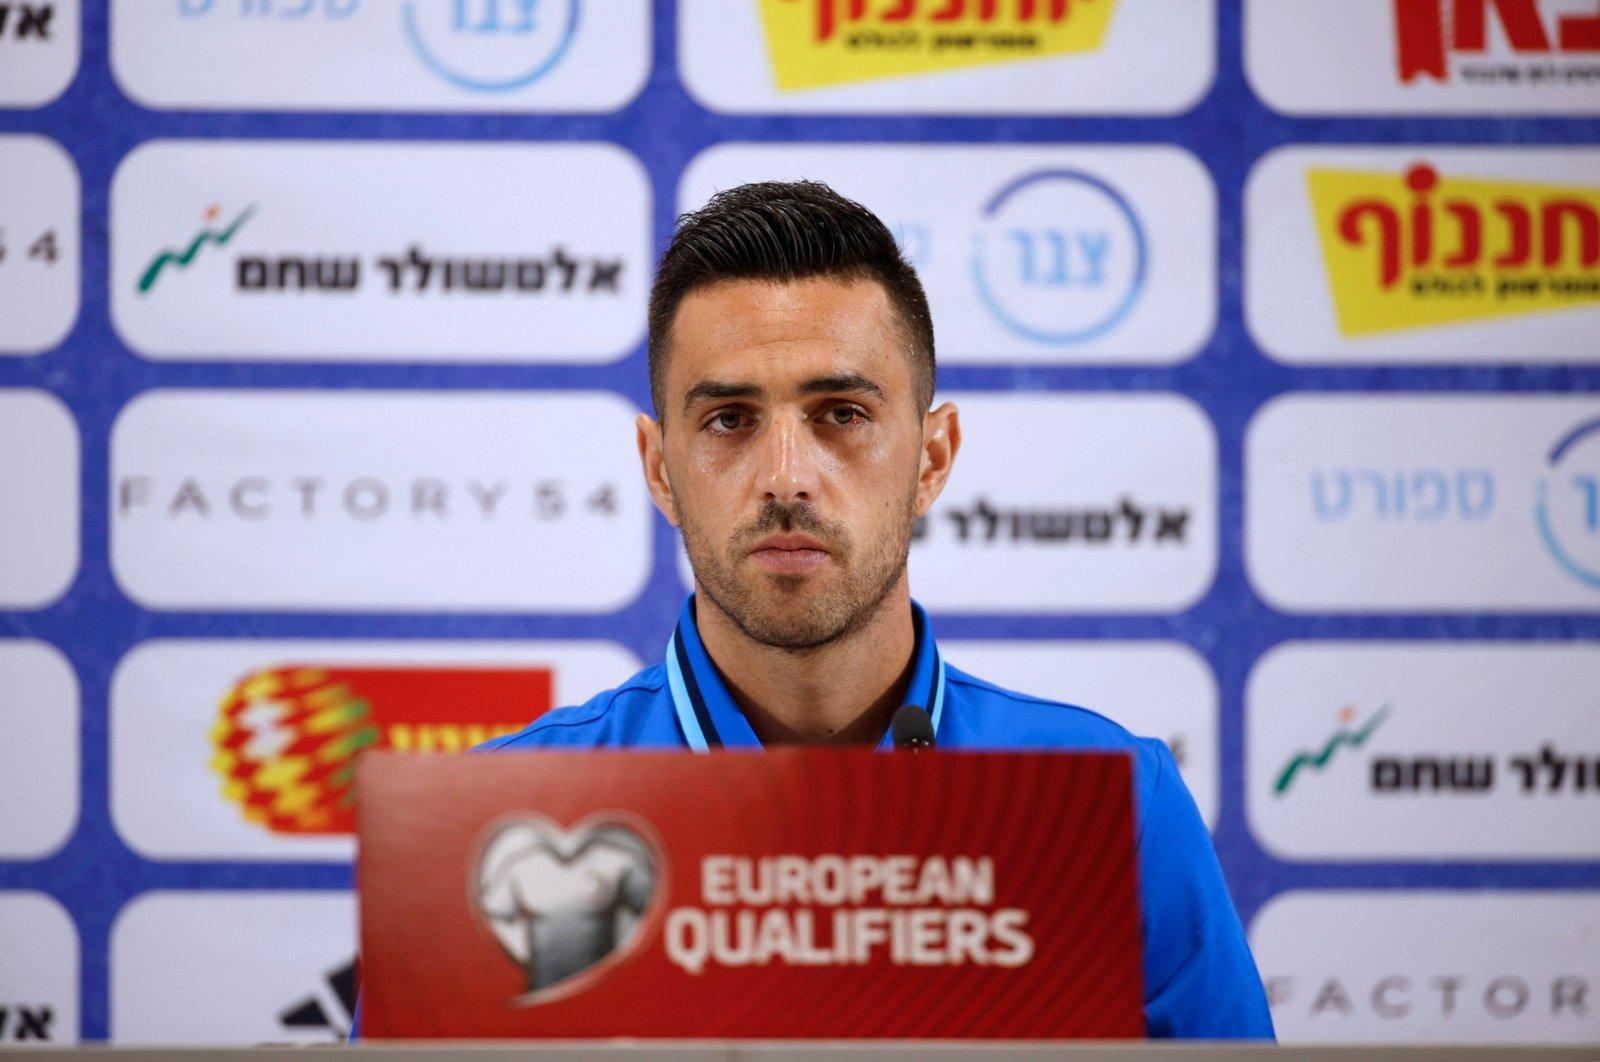 Israel's national team player Eran Zahavi speaks during a news conference, Haifa, Israel, on Sept. 4, 2016. (Reuters Photo)